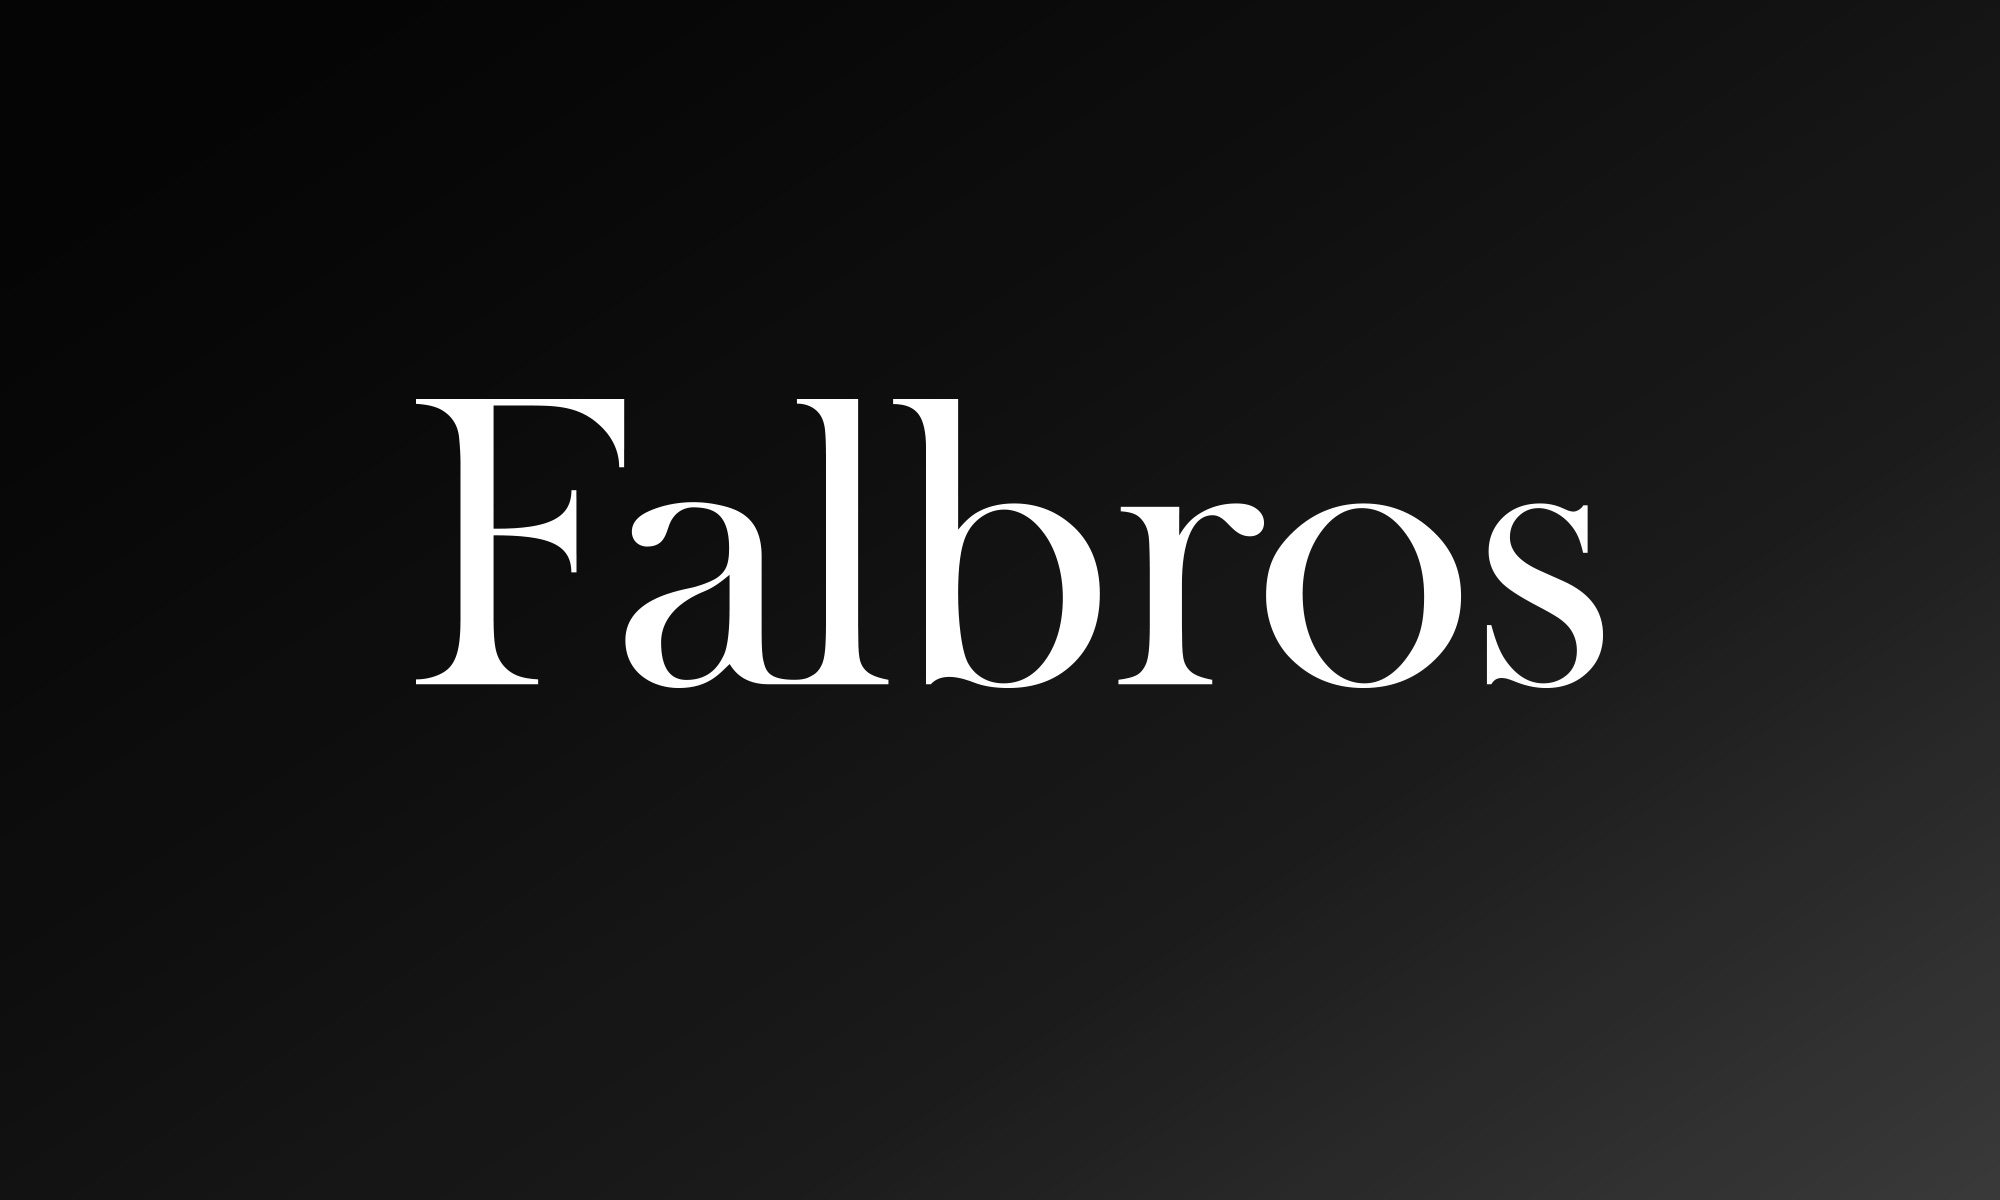 Falbros wordmark